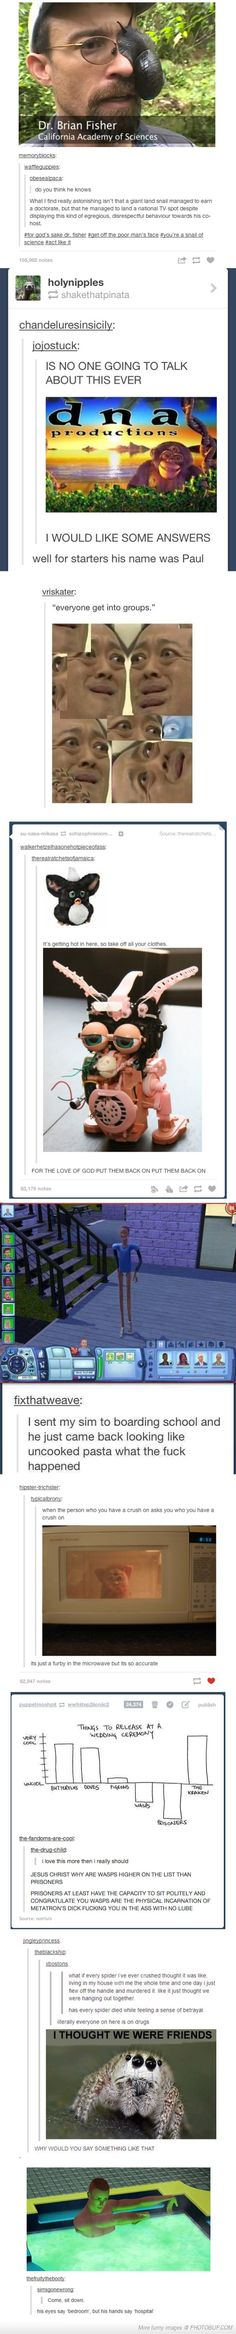 My Favorite Tumblr Posts